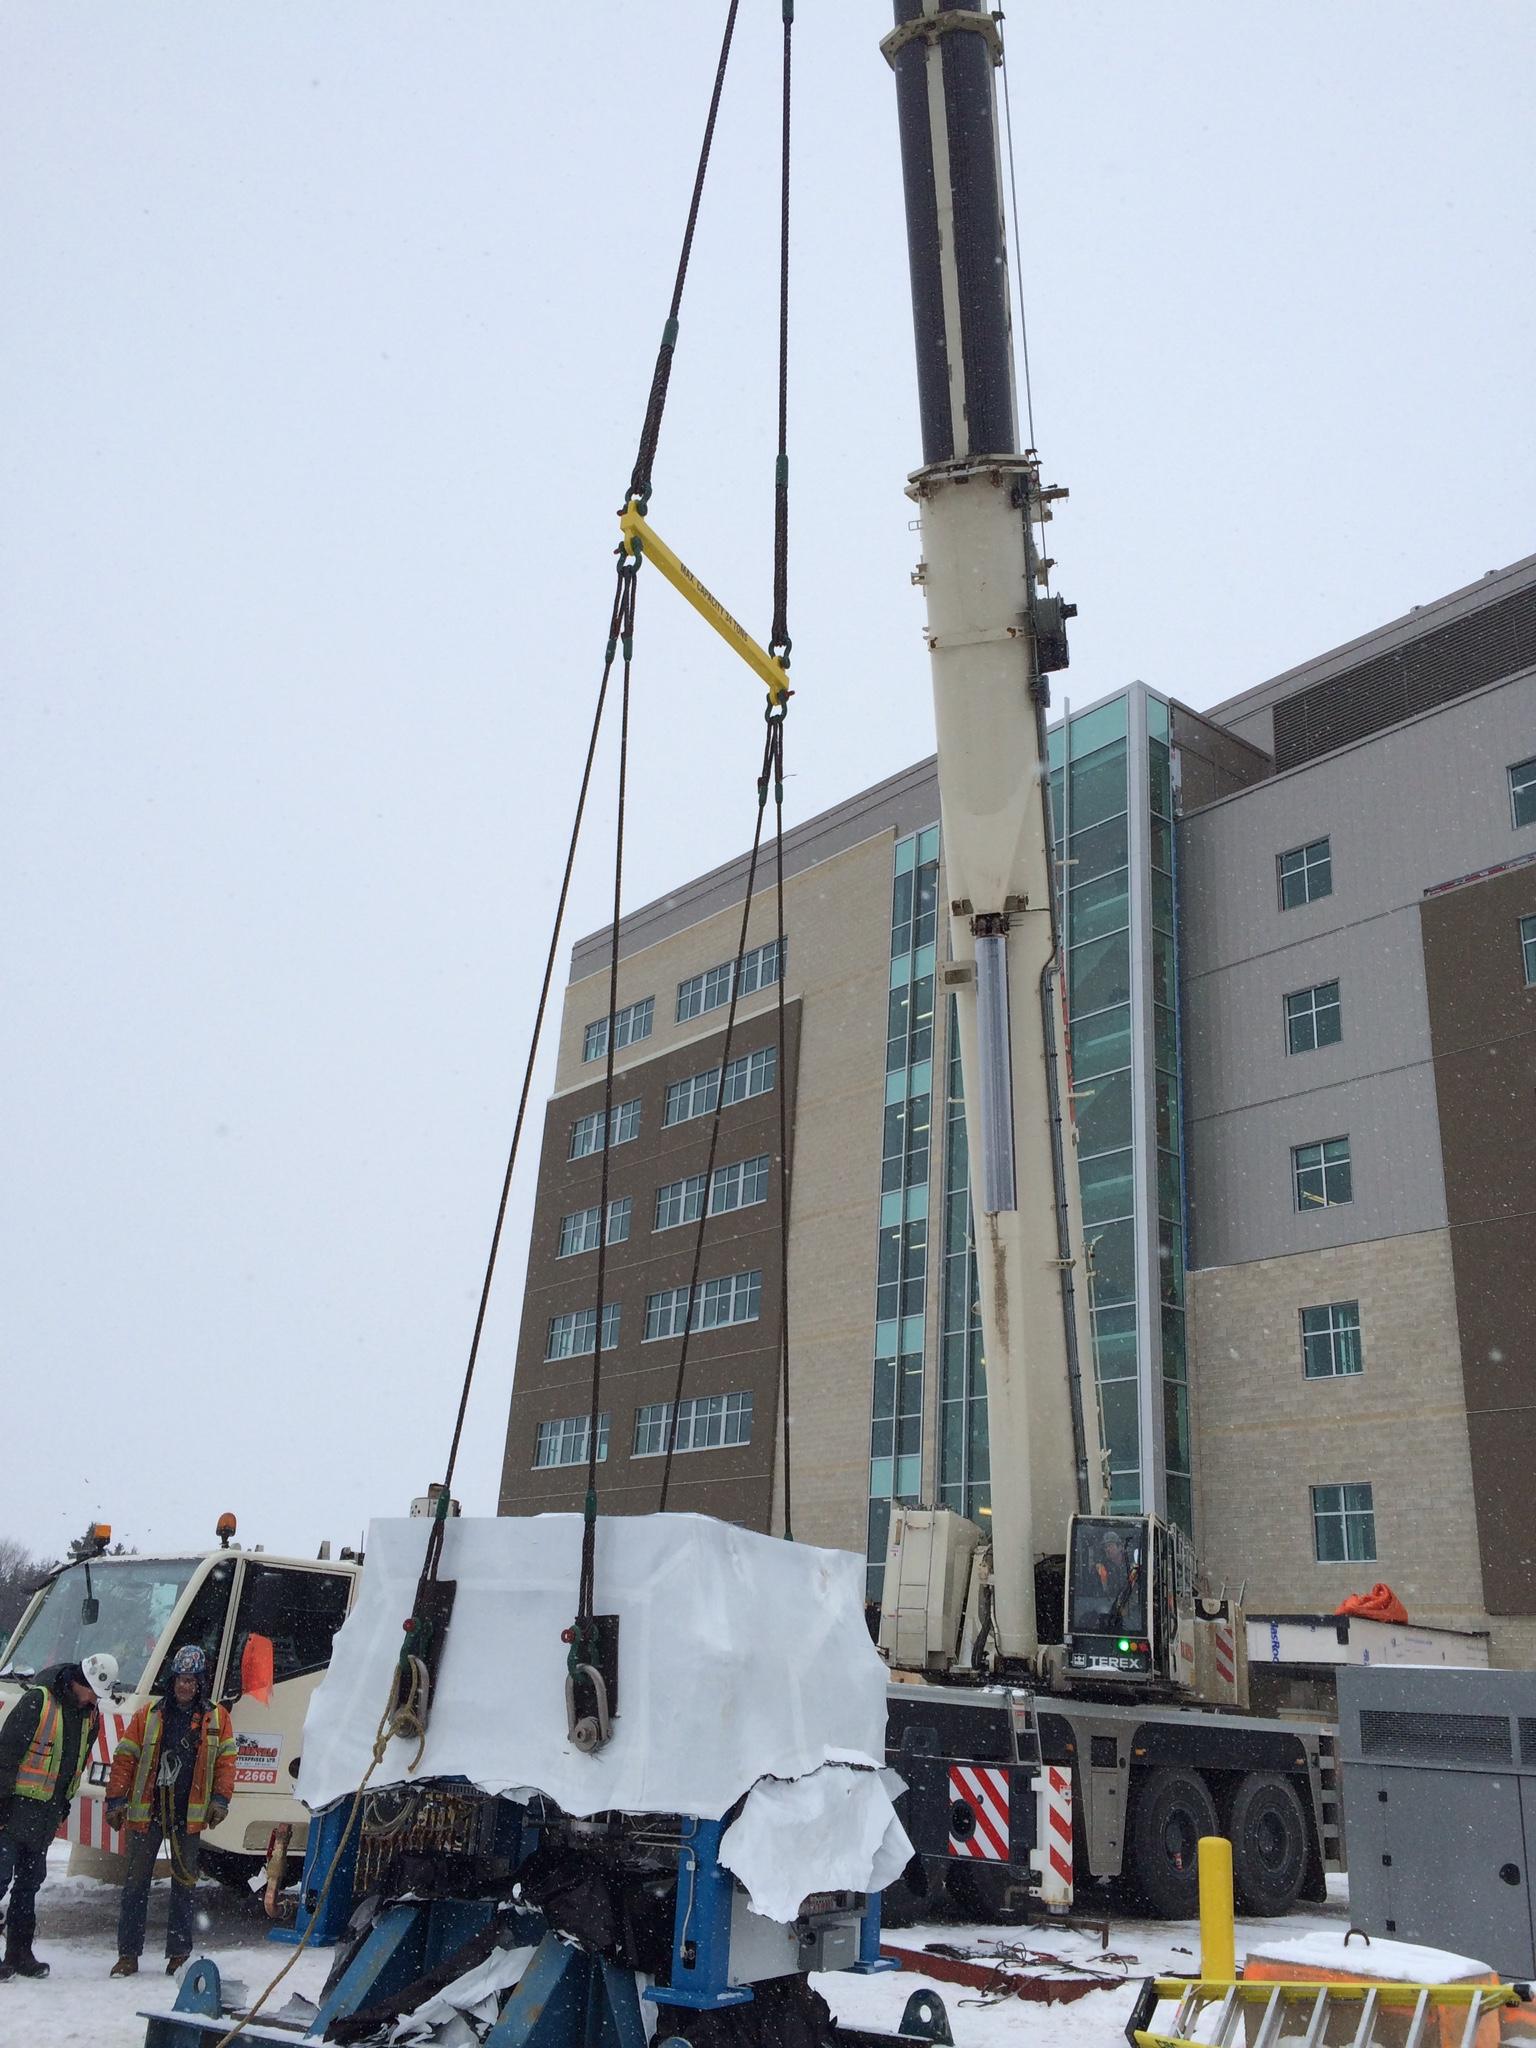 Lifting cyclotron by crane